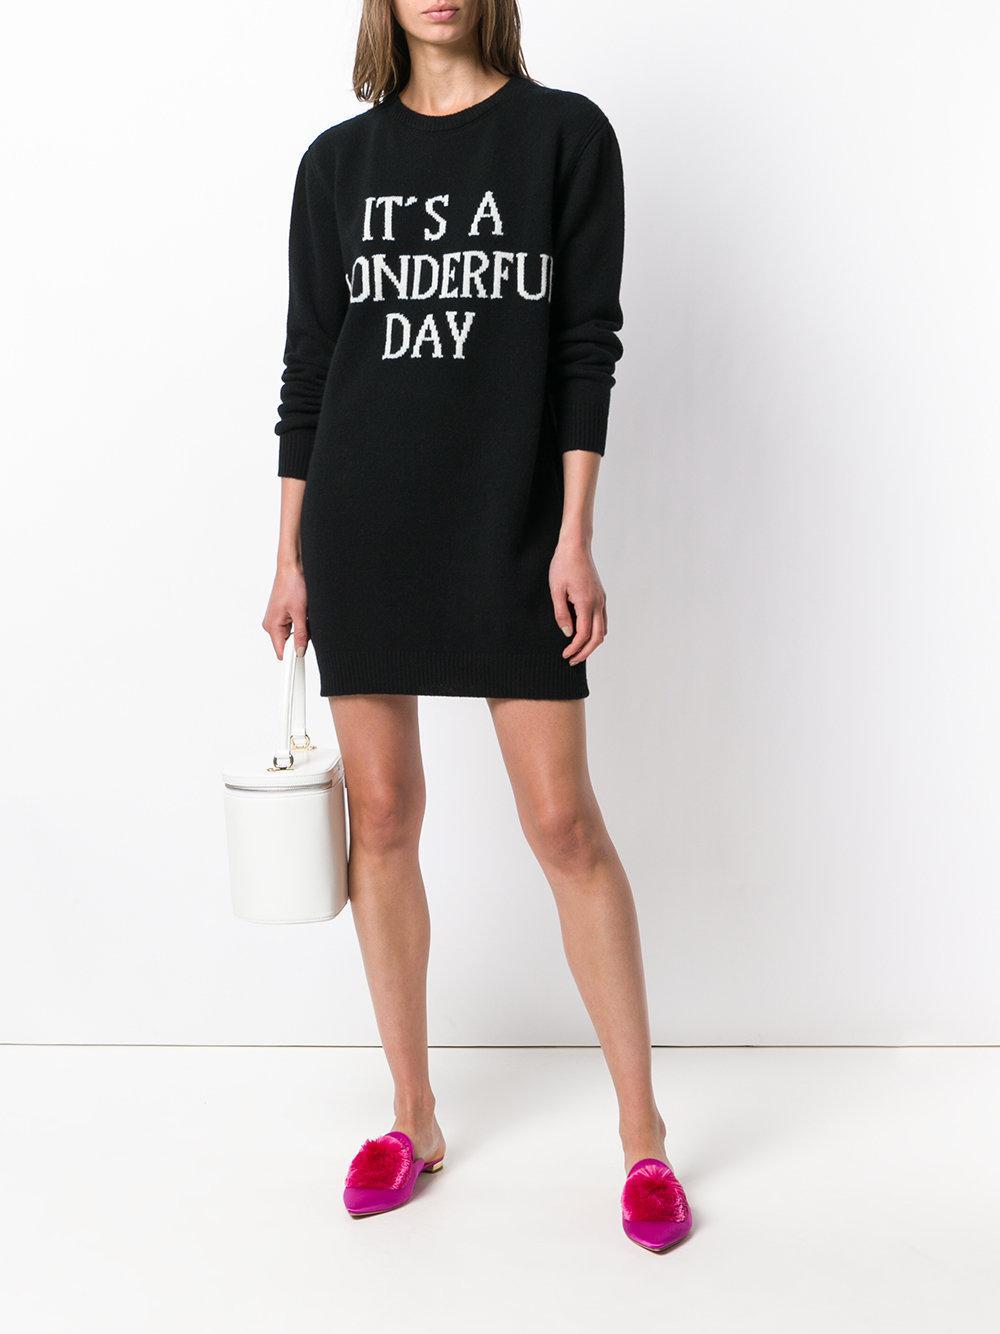 Its a Wonderful Day sweater dress - Black Alberta Ferretti Get The Latest Fashion Best Price Shop Cheap Price Outlet Shop tJrFwSERU